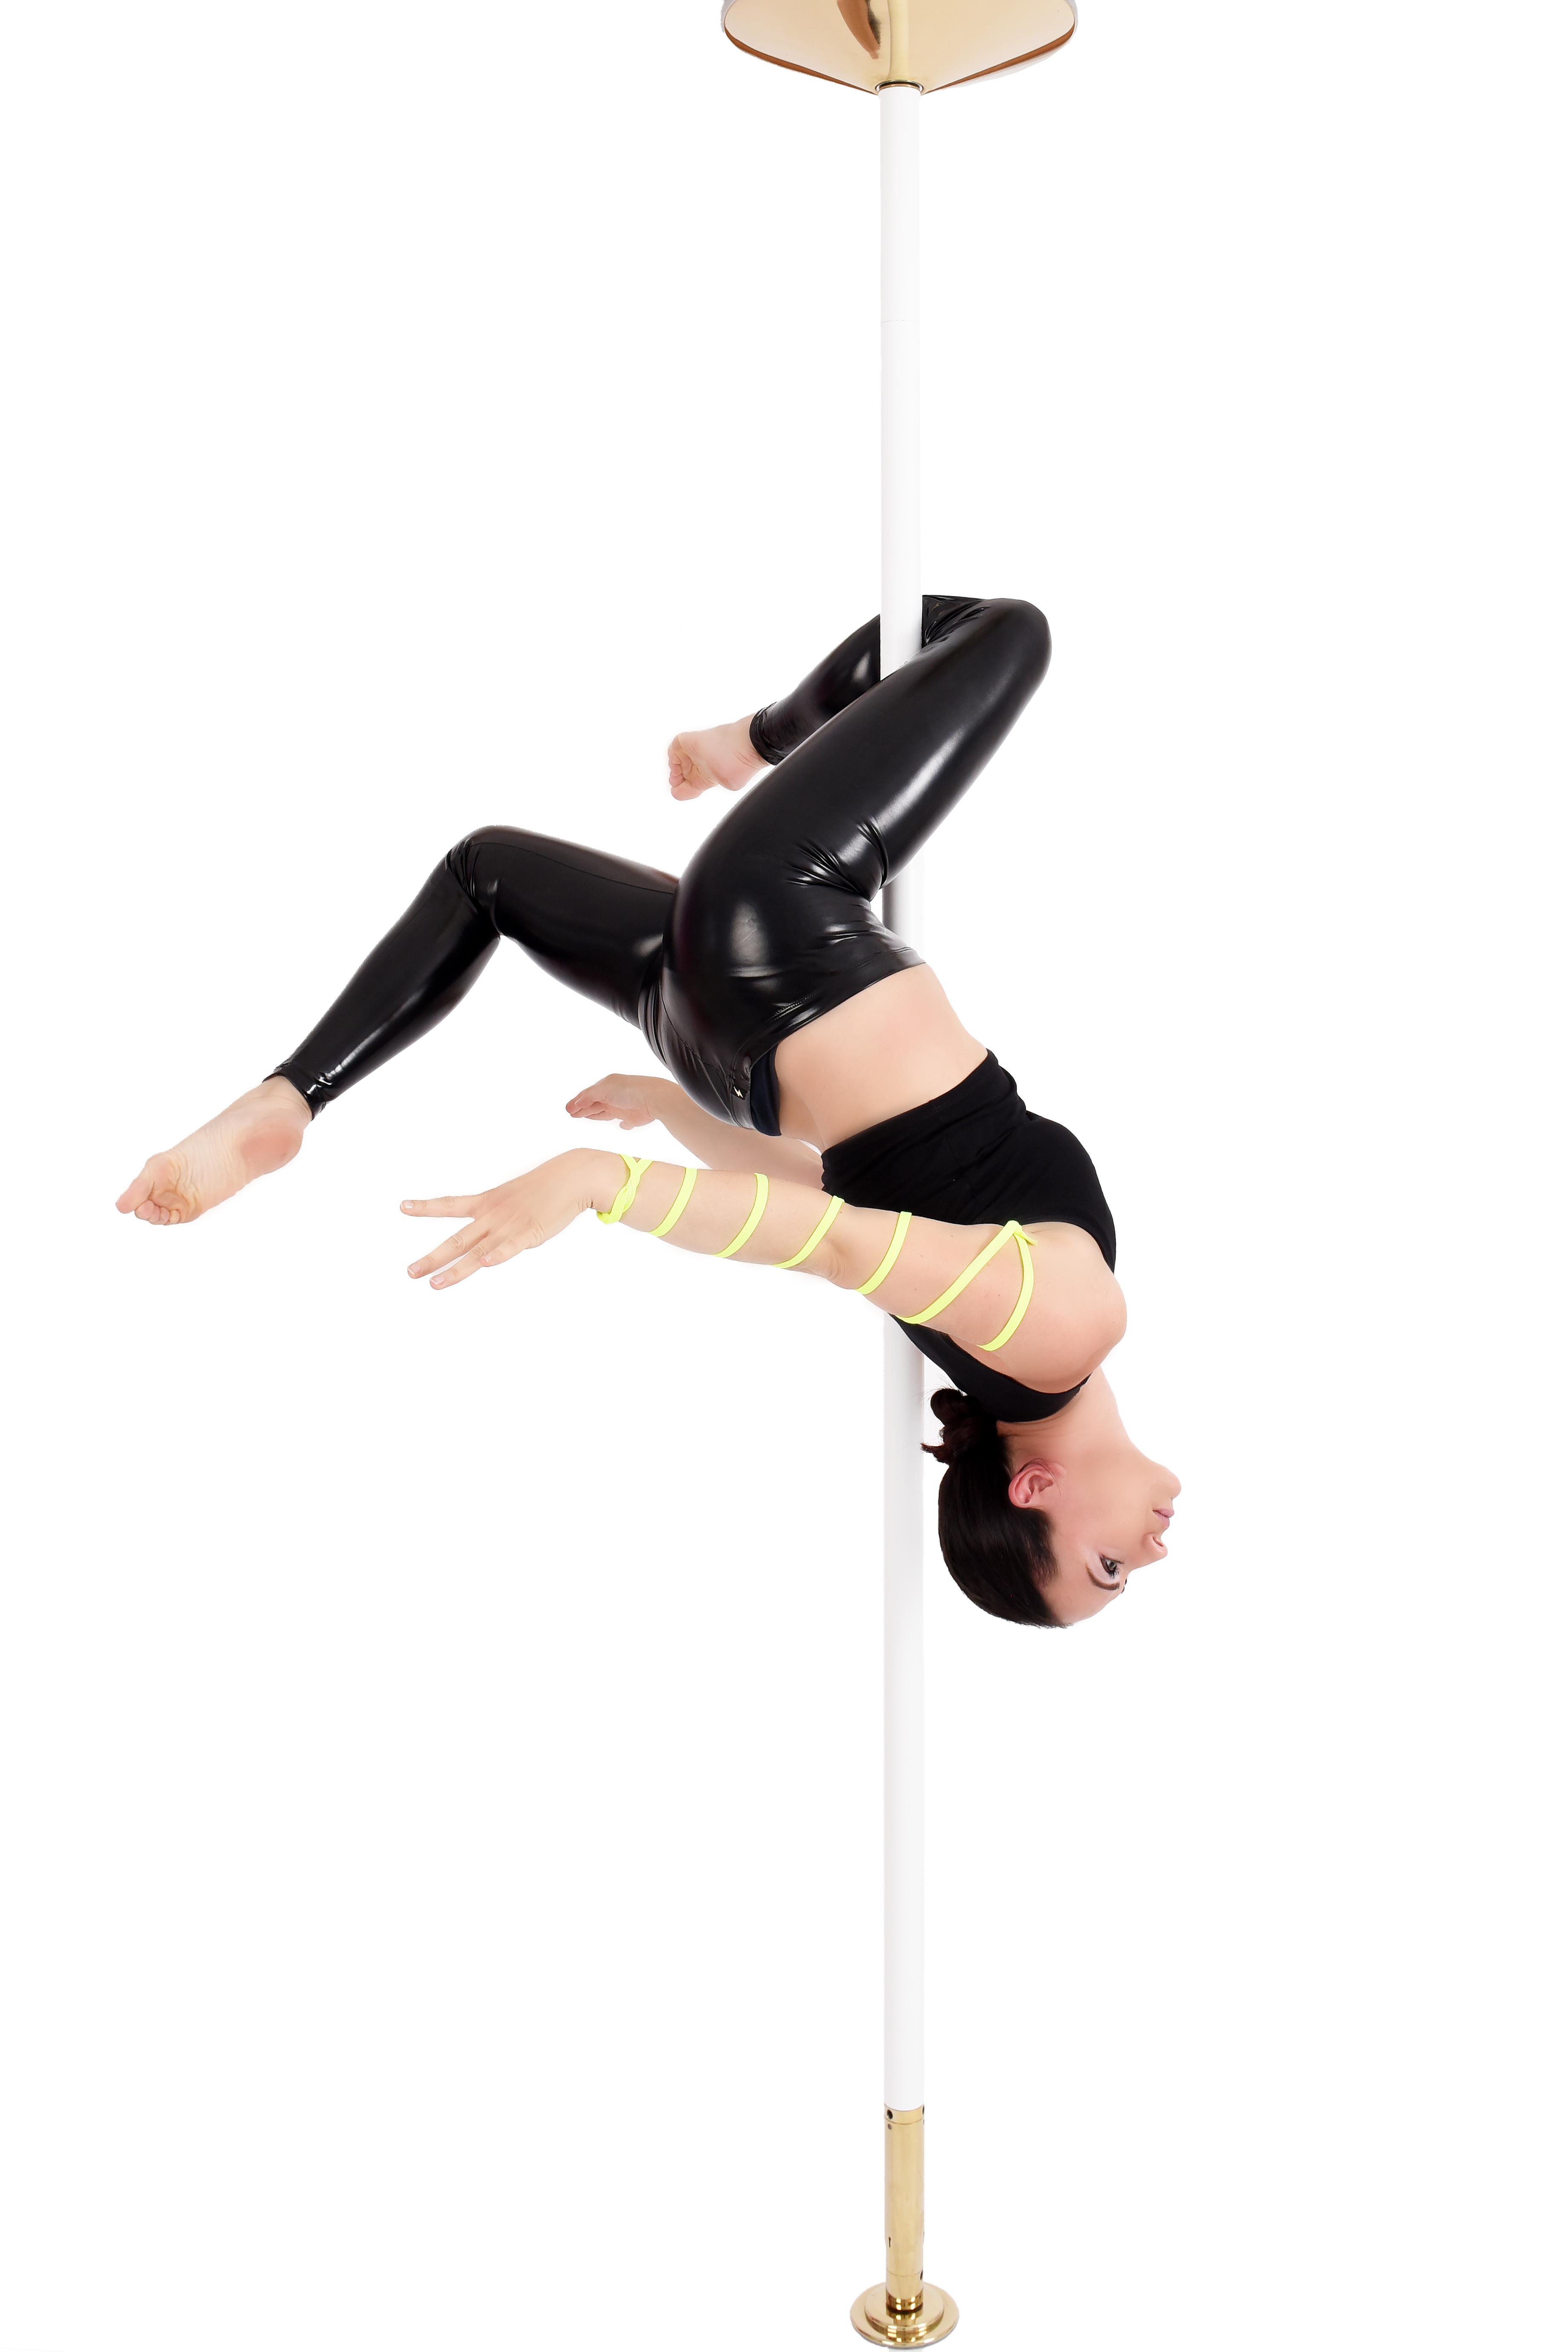 Maria Ammirato Pole Dance Academy Neuburg